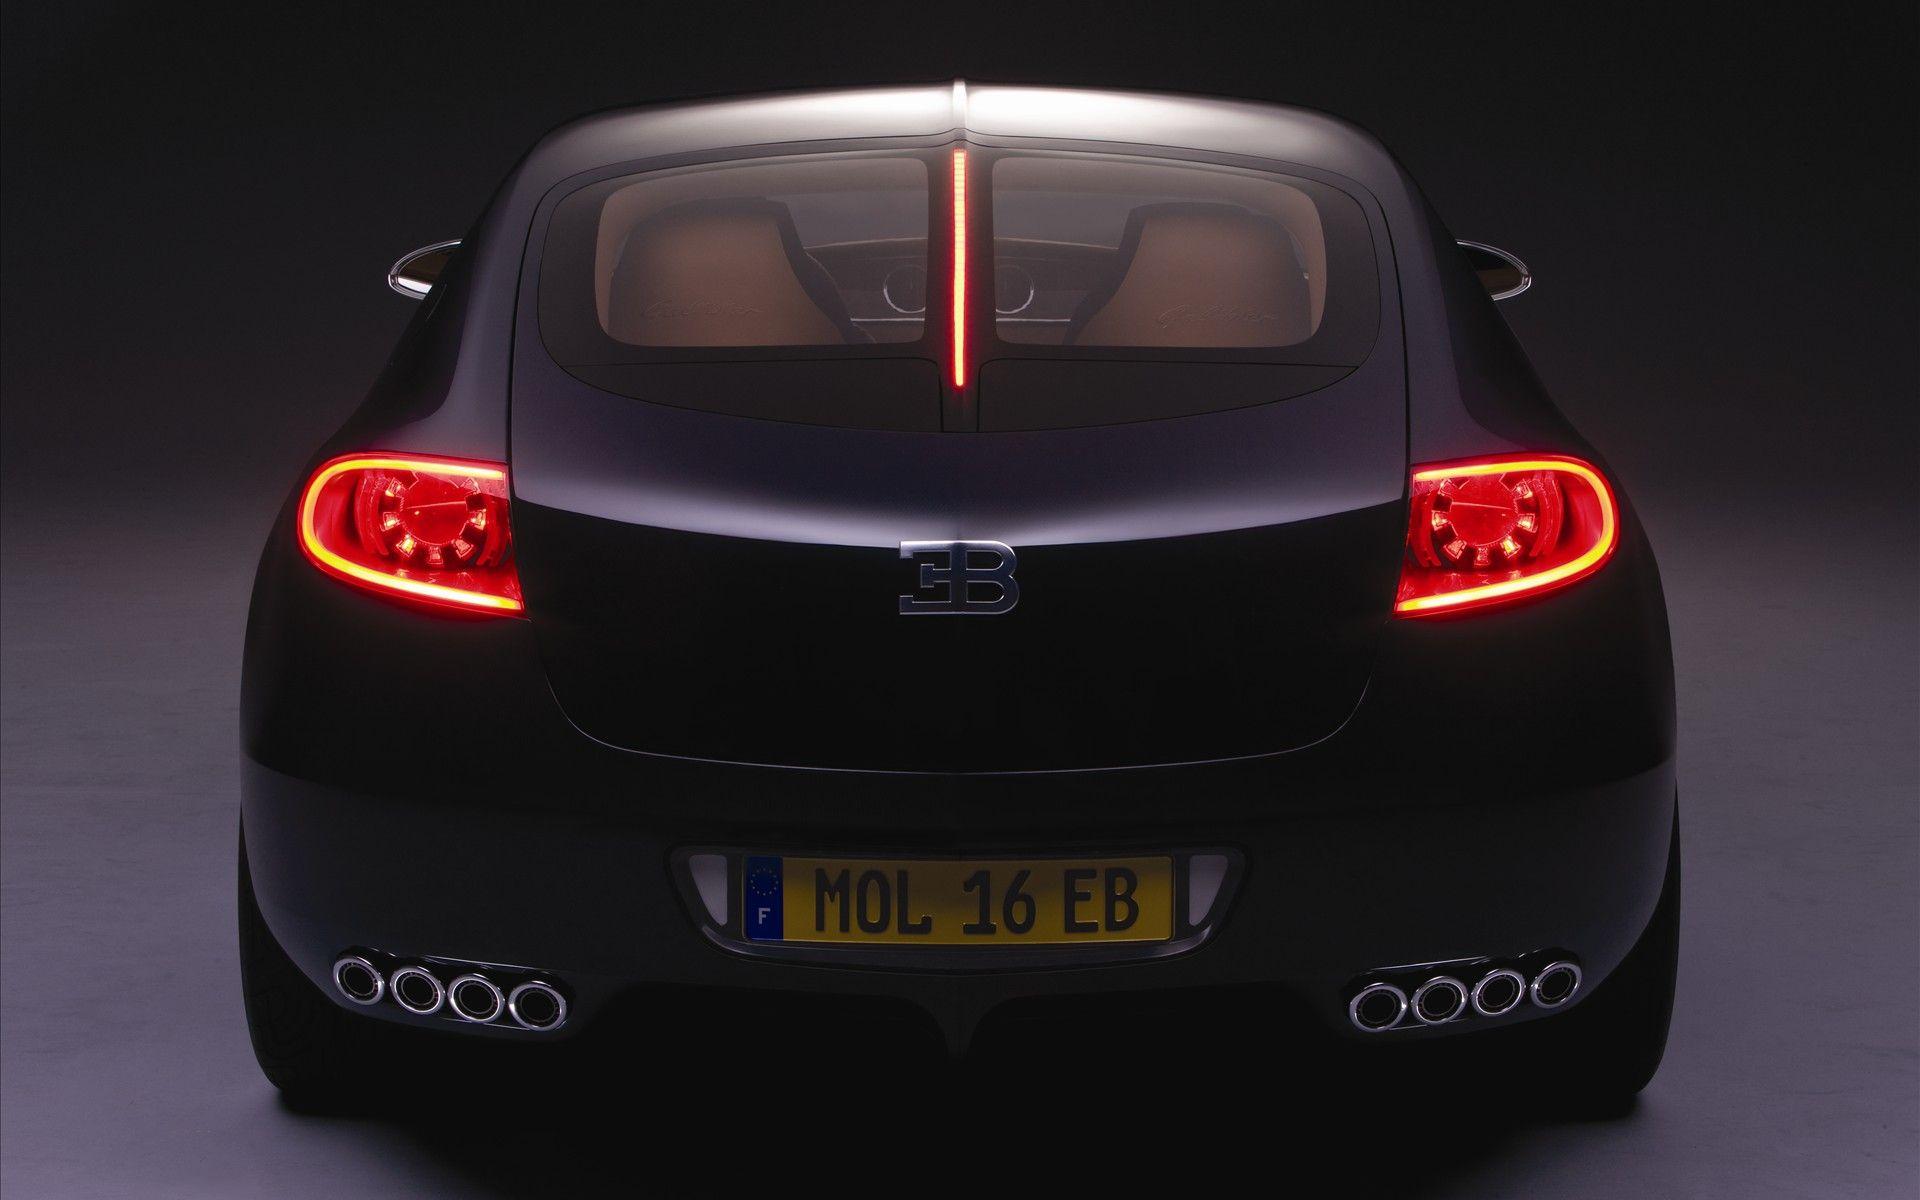 c8407eb58fed9a49fadbfd29ad2b805b Outstanding Bugatti Veyron Need for Speed Underground 2 Cars Trend